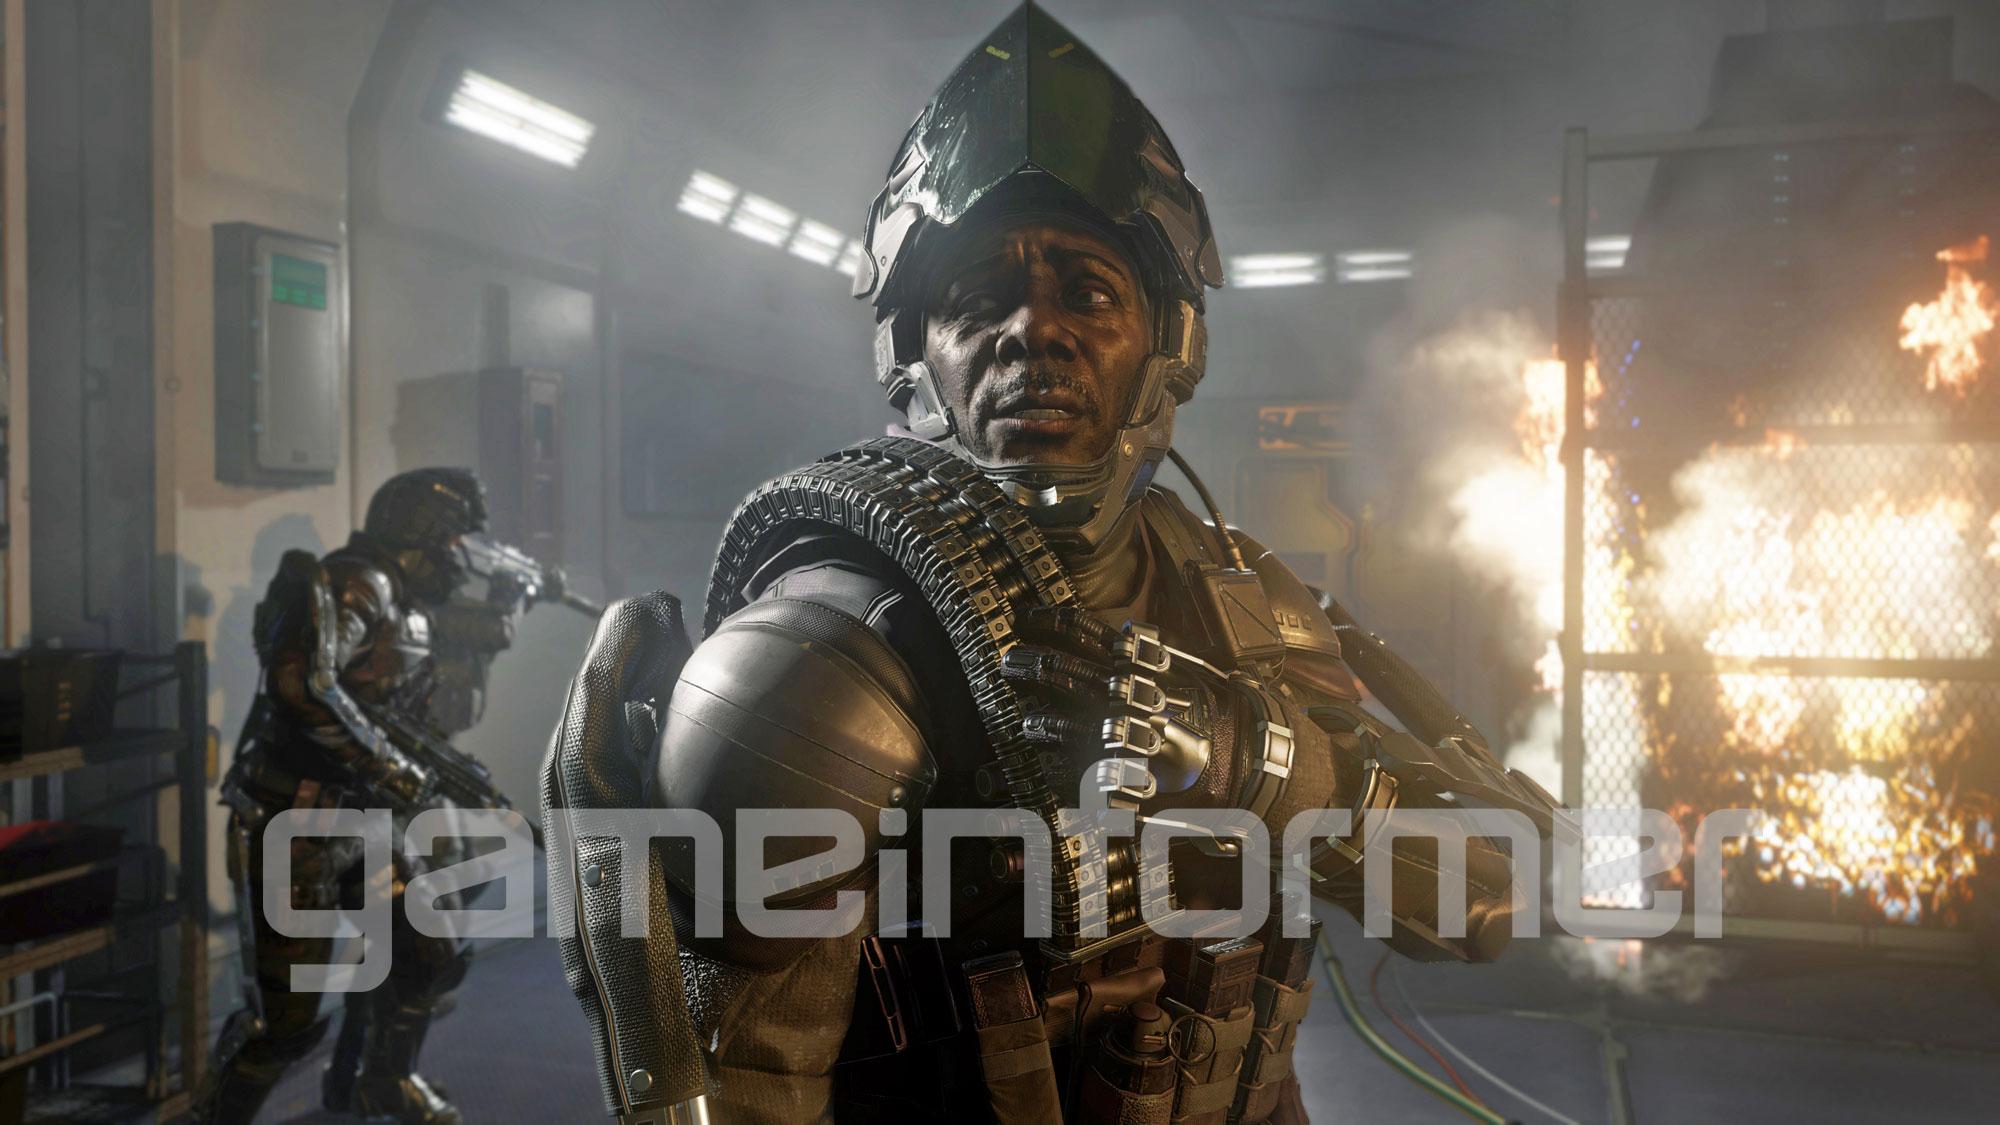 「Call of Duty」の新作公式サイトが公開! 舞台は近未来の模様